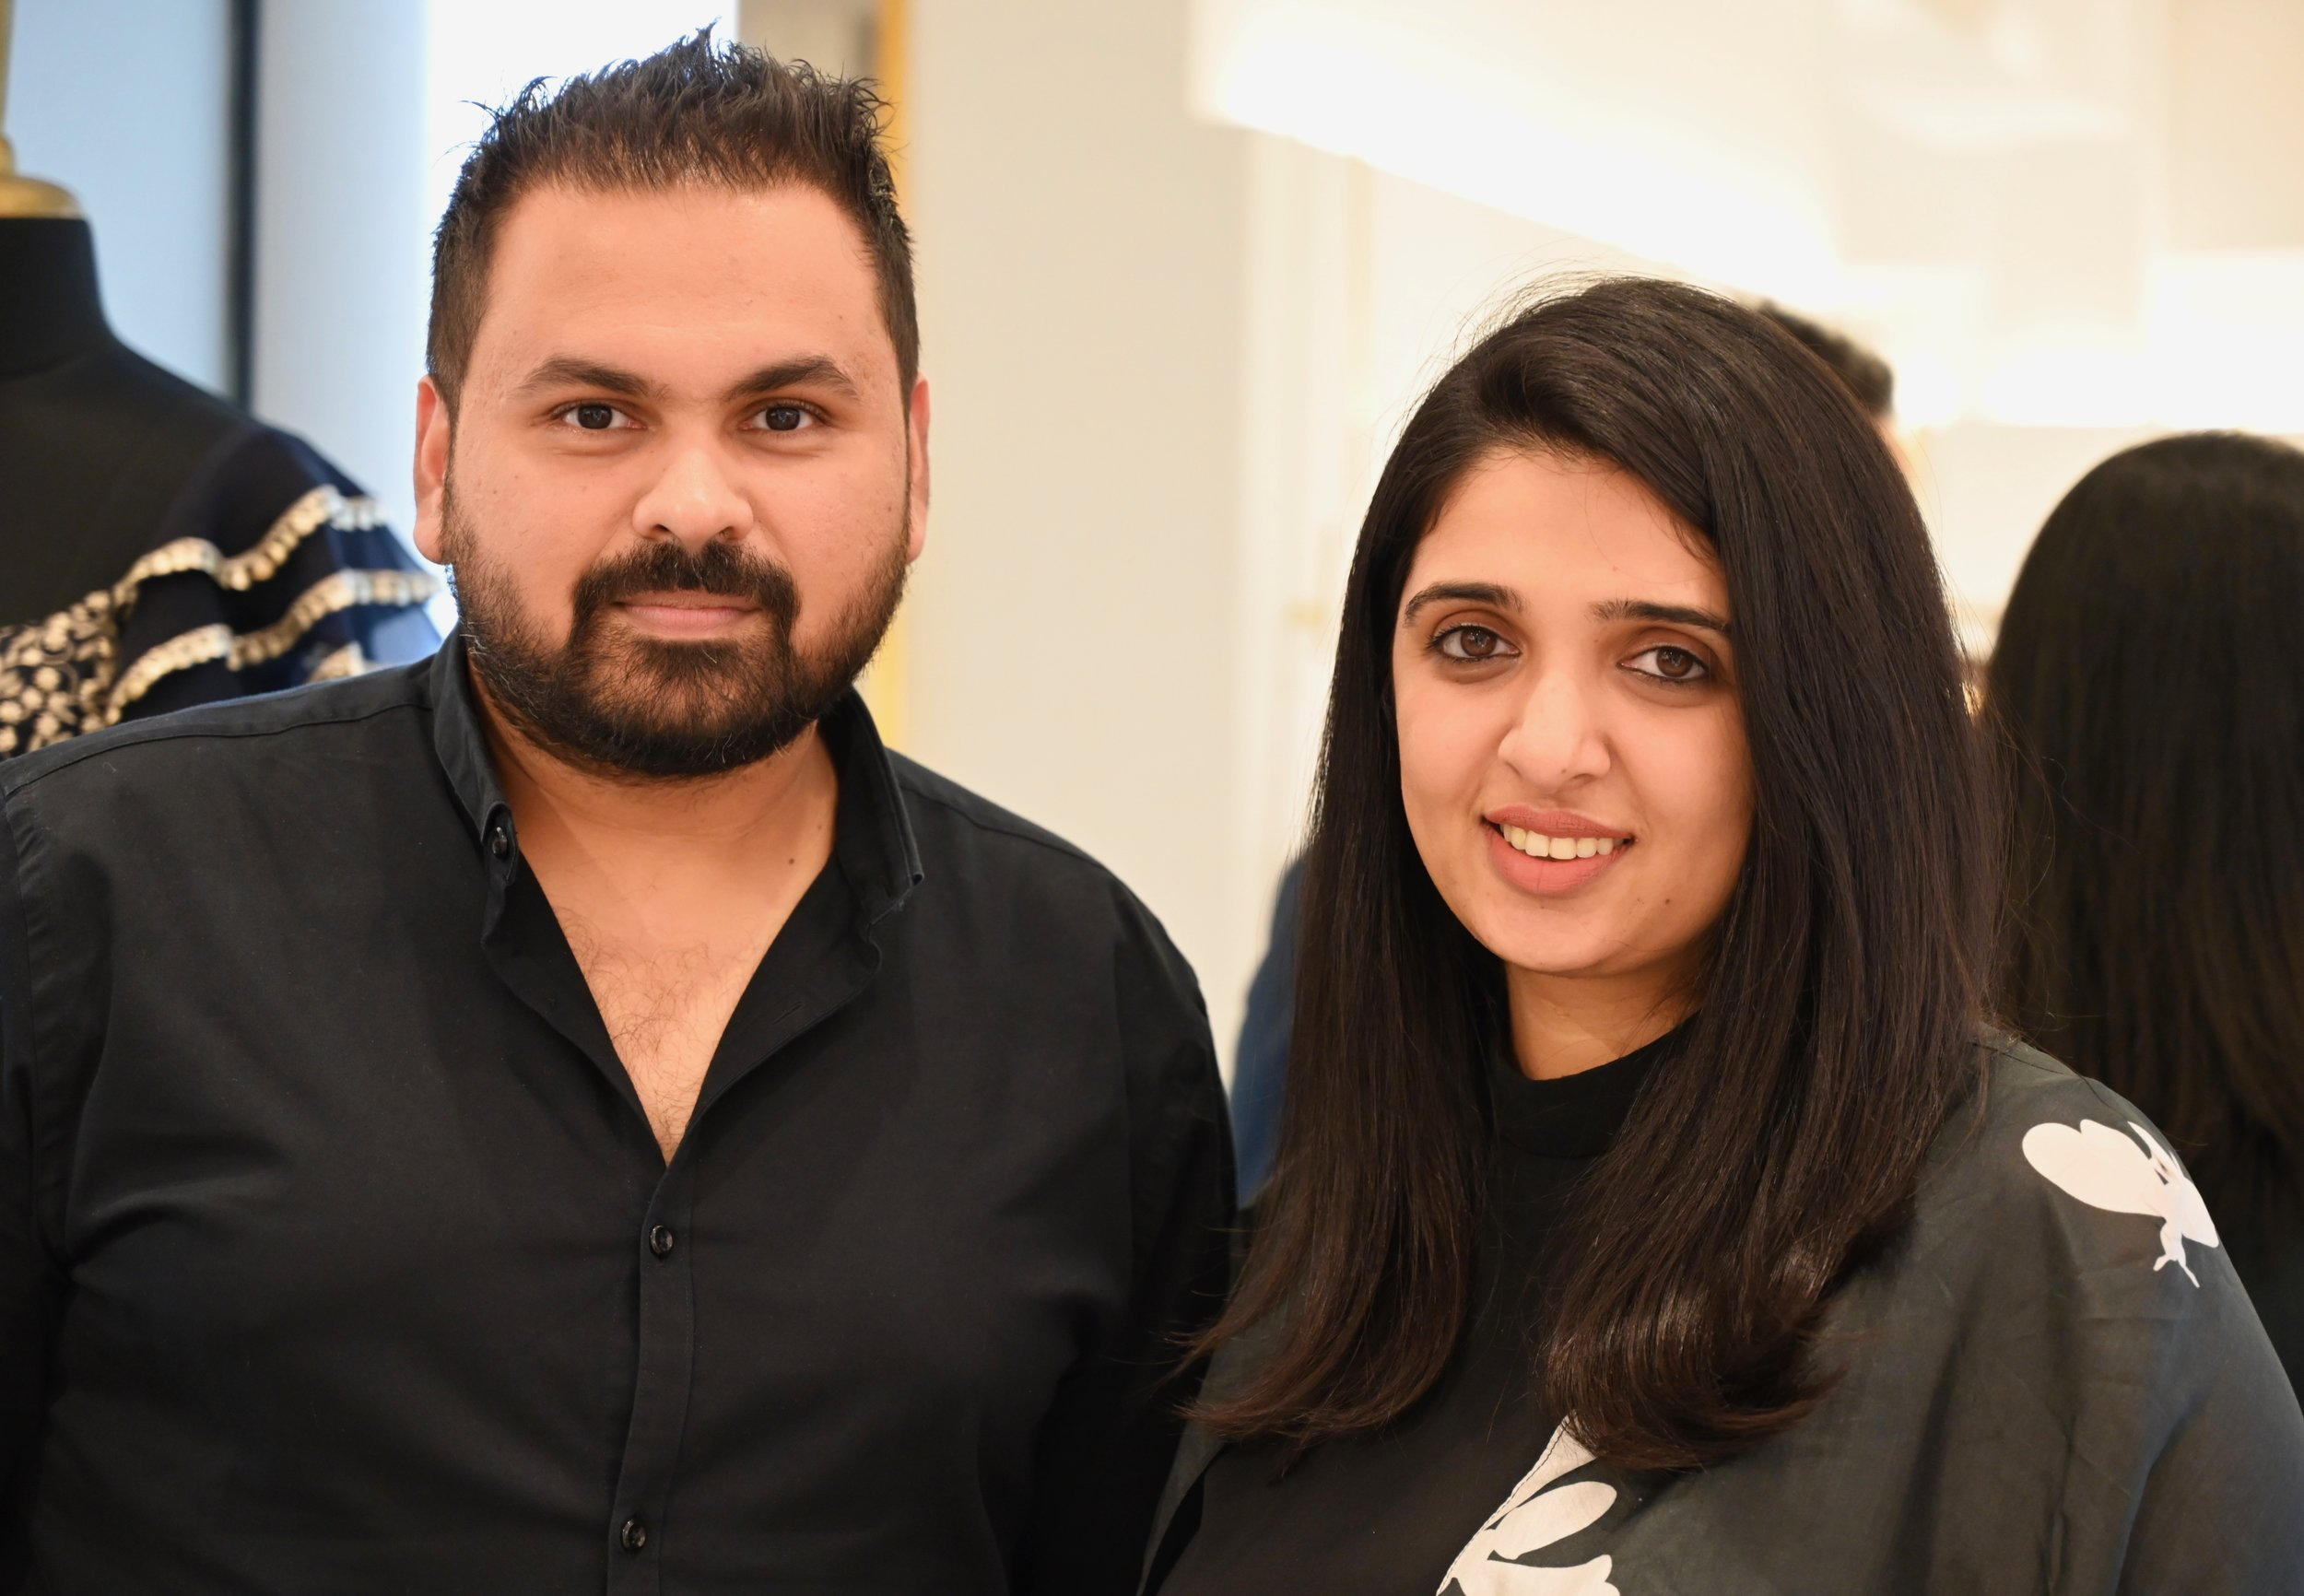 Designers Sonam and Paras Modi